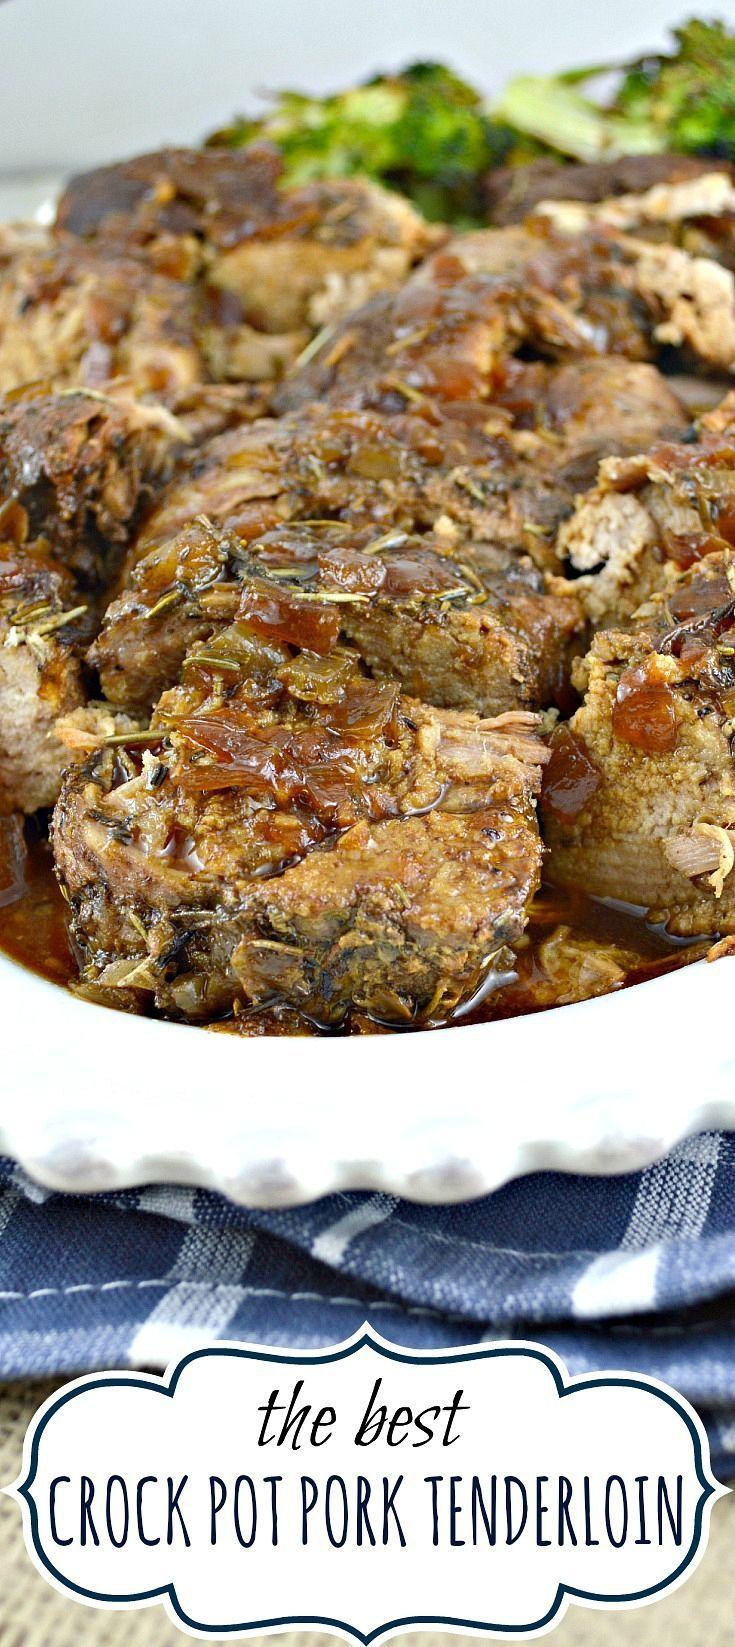 Crock pot pork tenderloin. This recipe makes an incredibly tender, moist,flavorful pork tenderloin with a fabulous pan sauce/gravy. All from scratch-no canned soup!  For Dinner tonight!